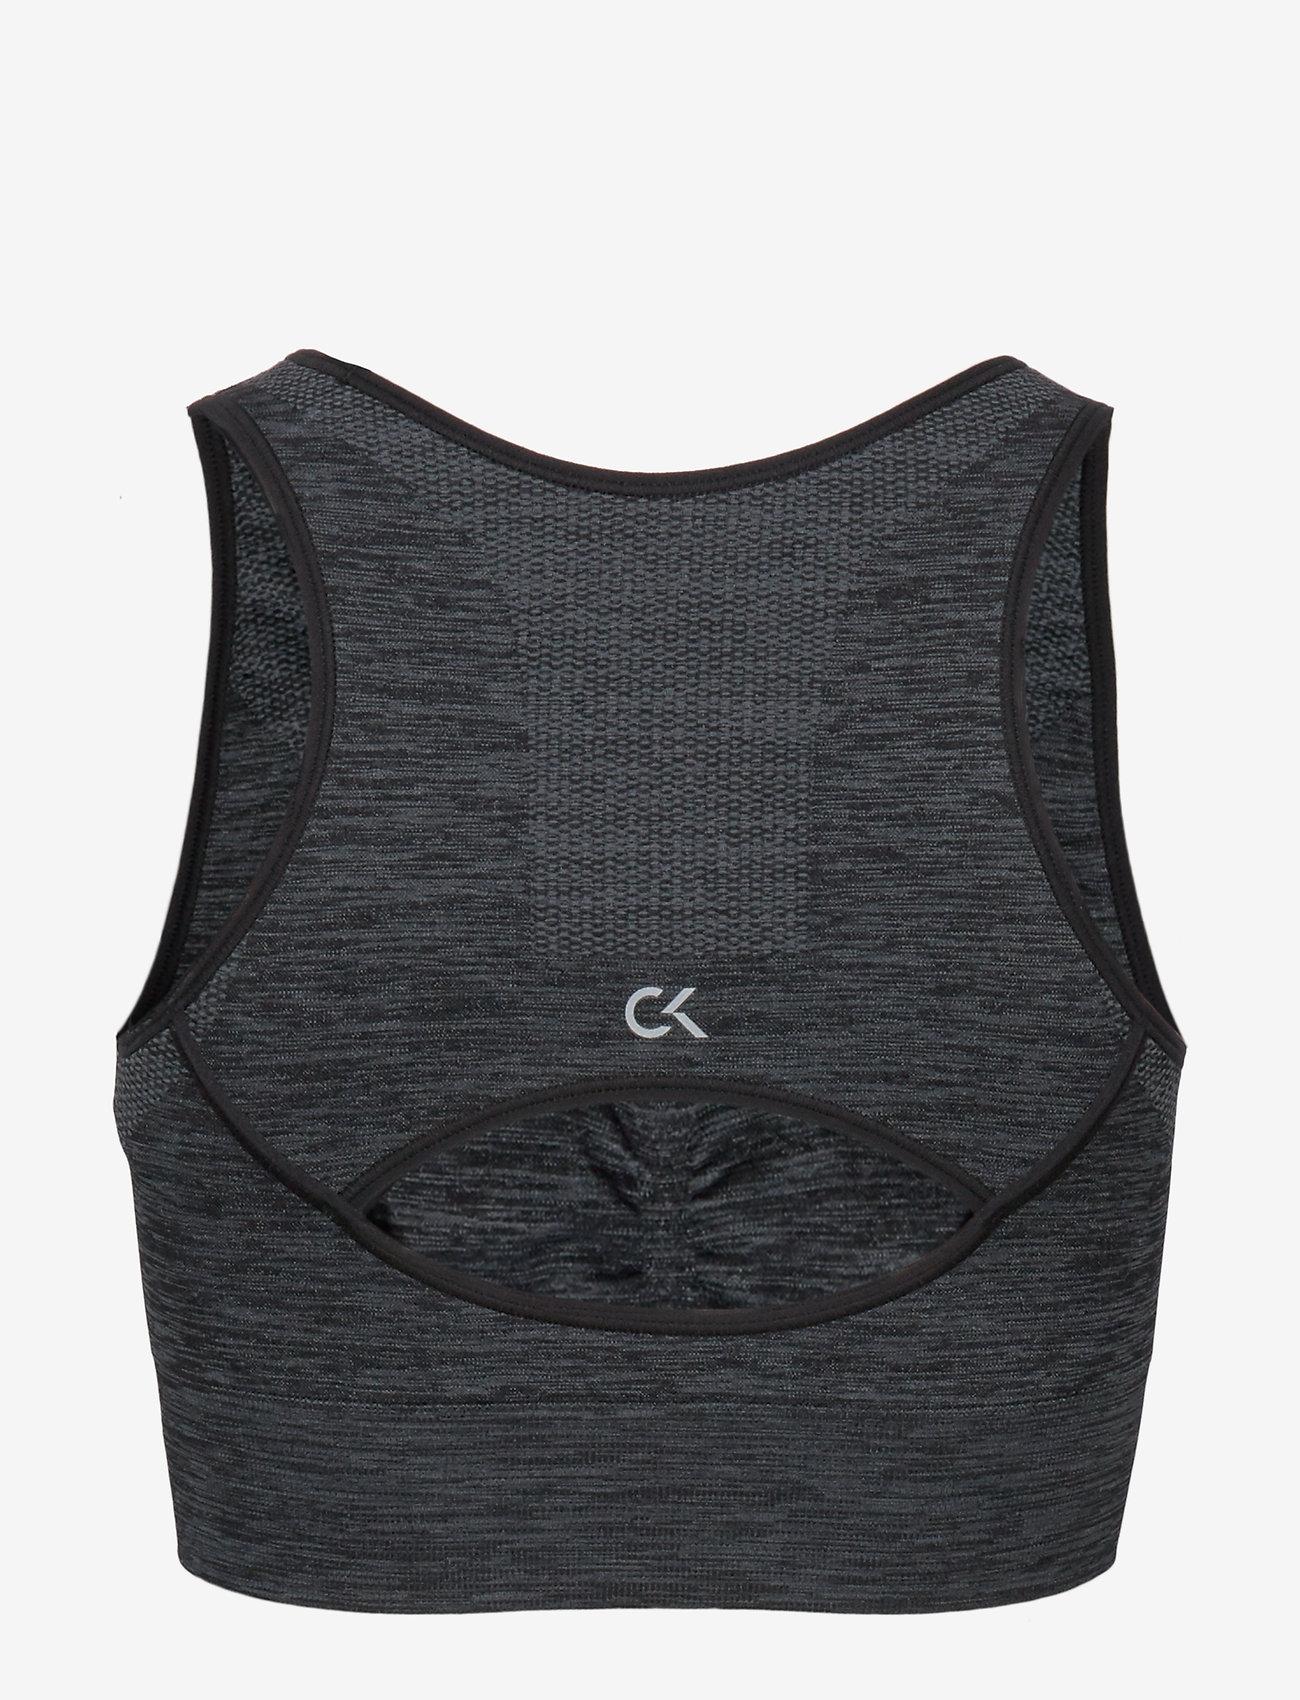 Medium Support Bra (Ck Black) (£48